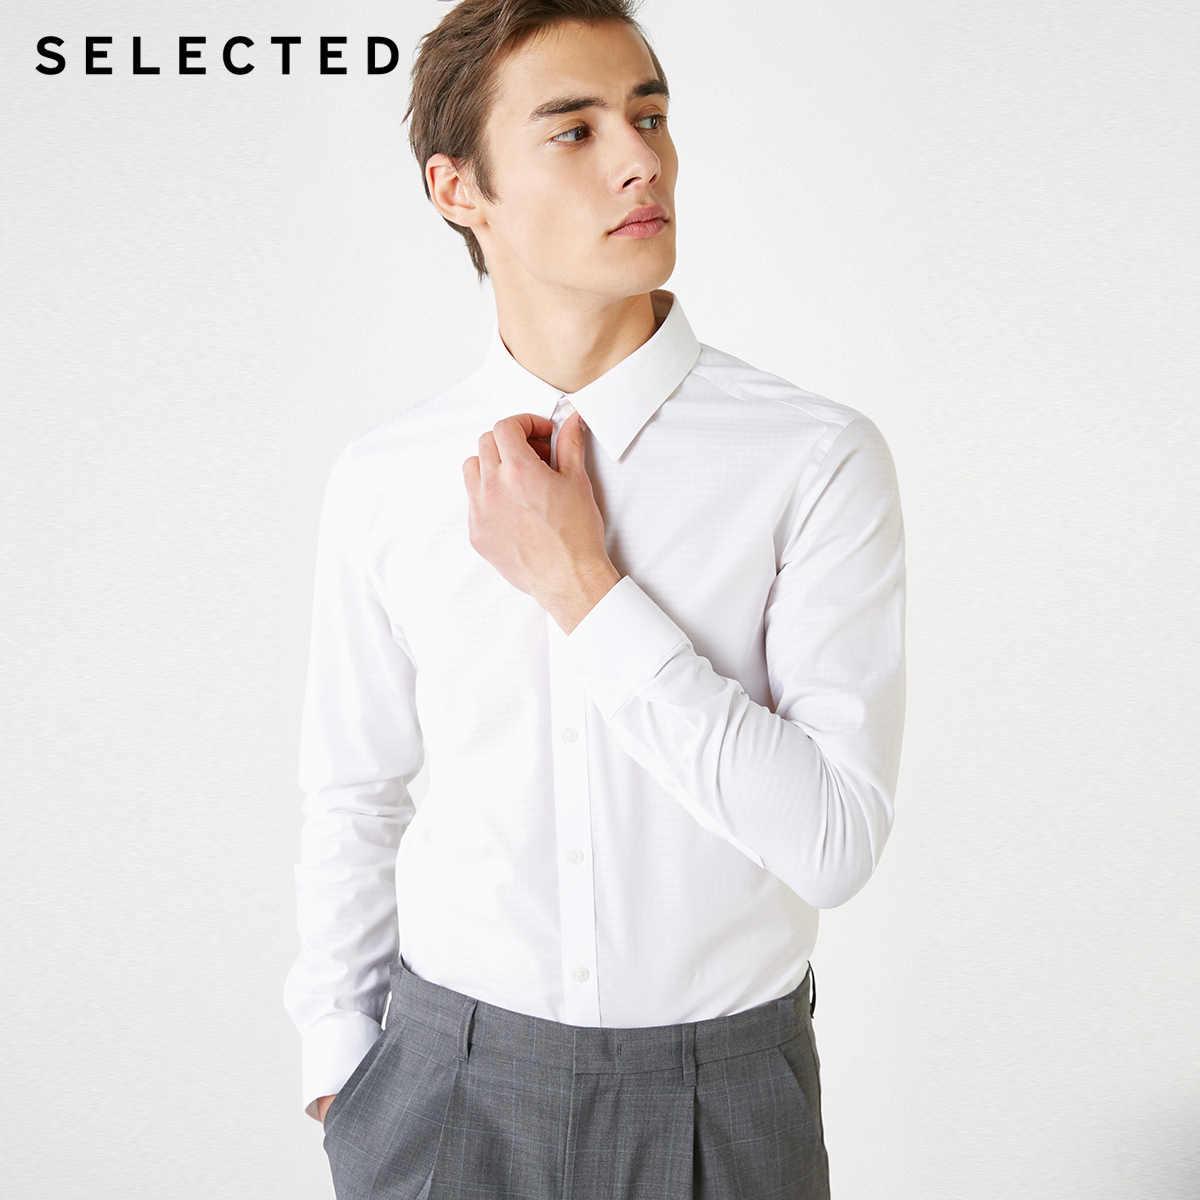 SELECTED Men's Dark 슬림 피트 긴팔 기질 비즈니스 캐주얼 셔츠 T | 419105505